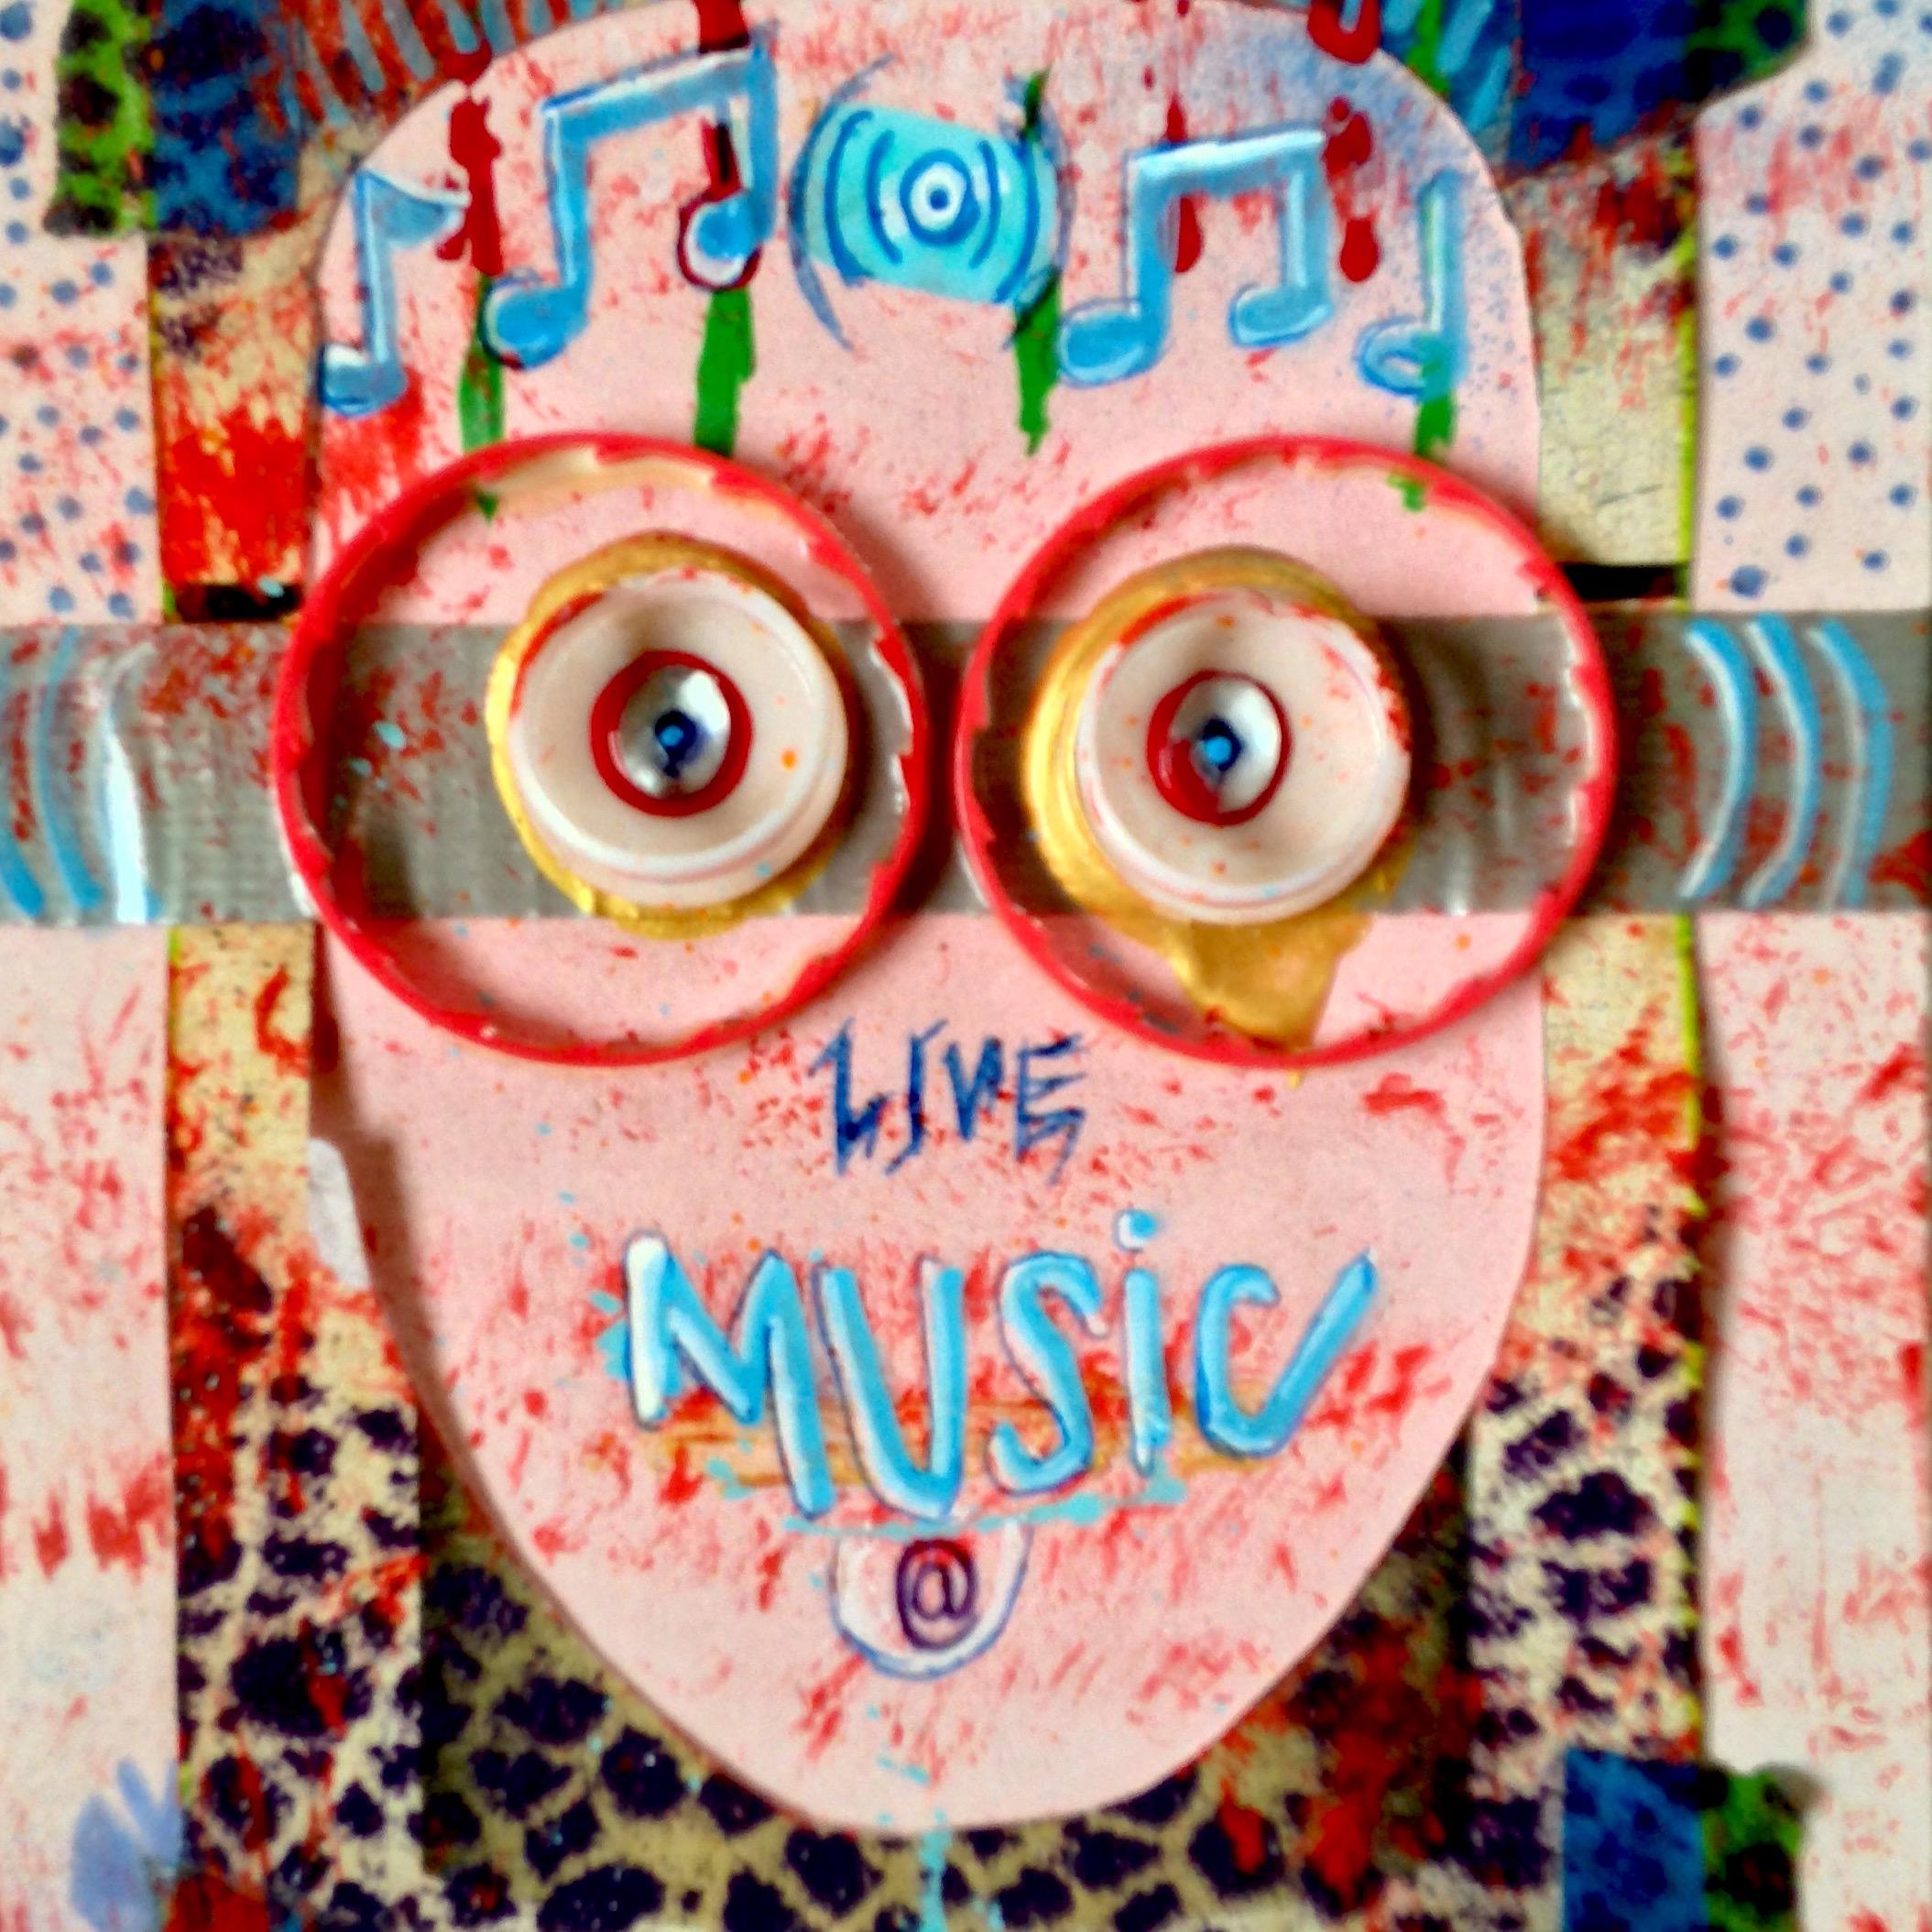 Live Music (2016)